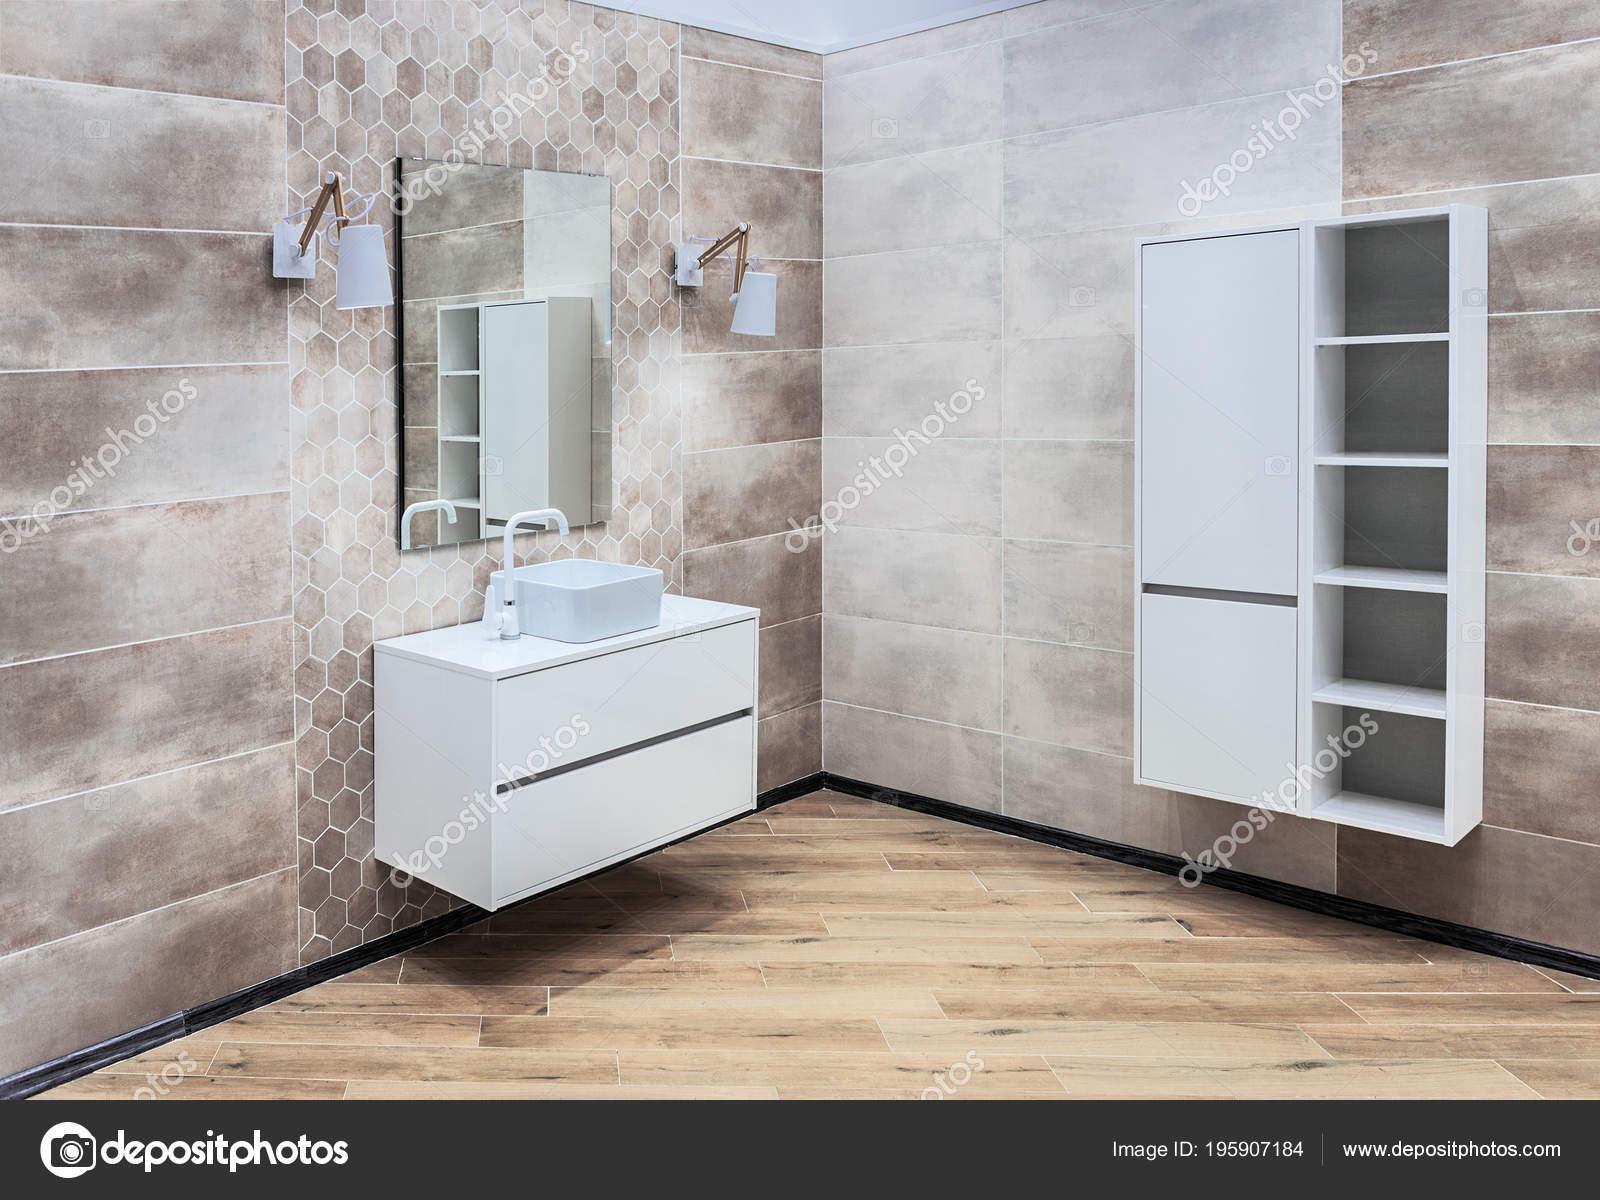 Grote Wastafel Badkamer : Moderne grote badkamer met wastafel spiegel hangende kast